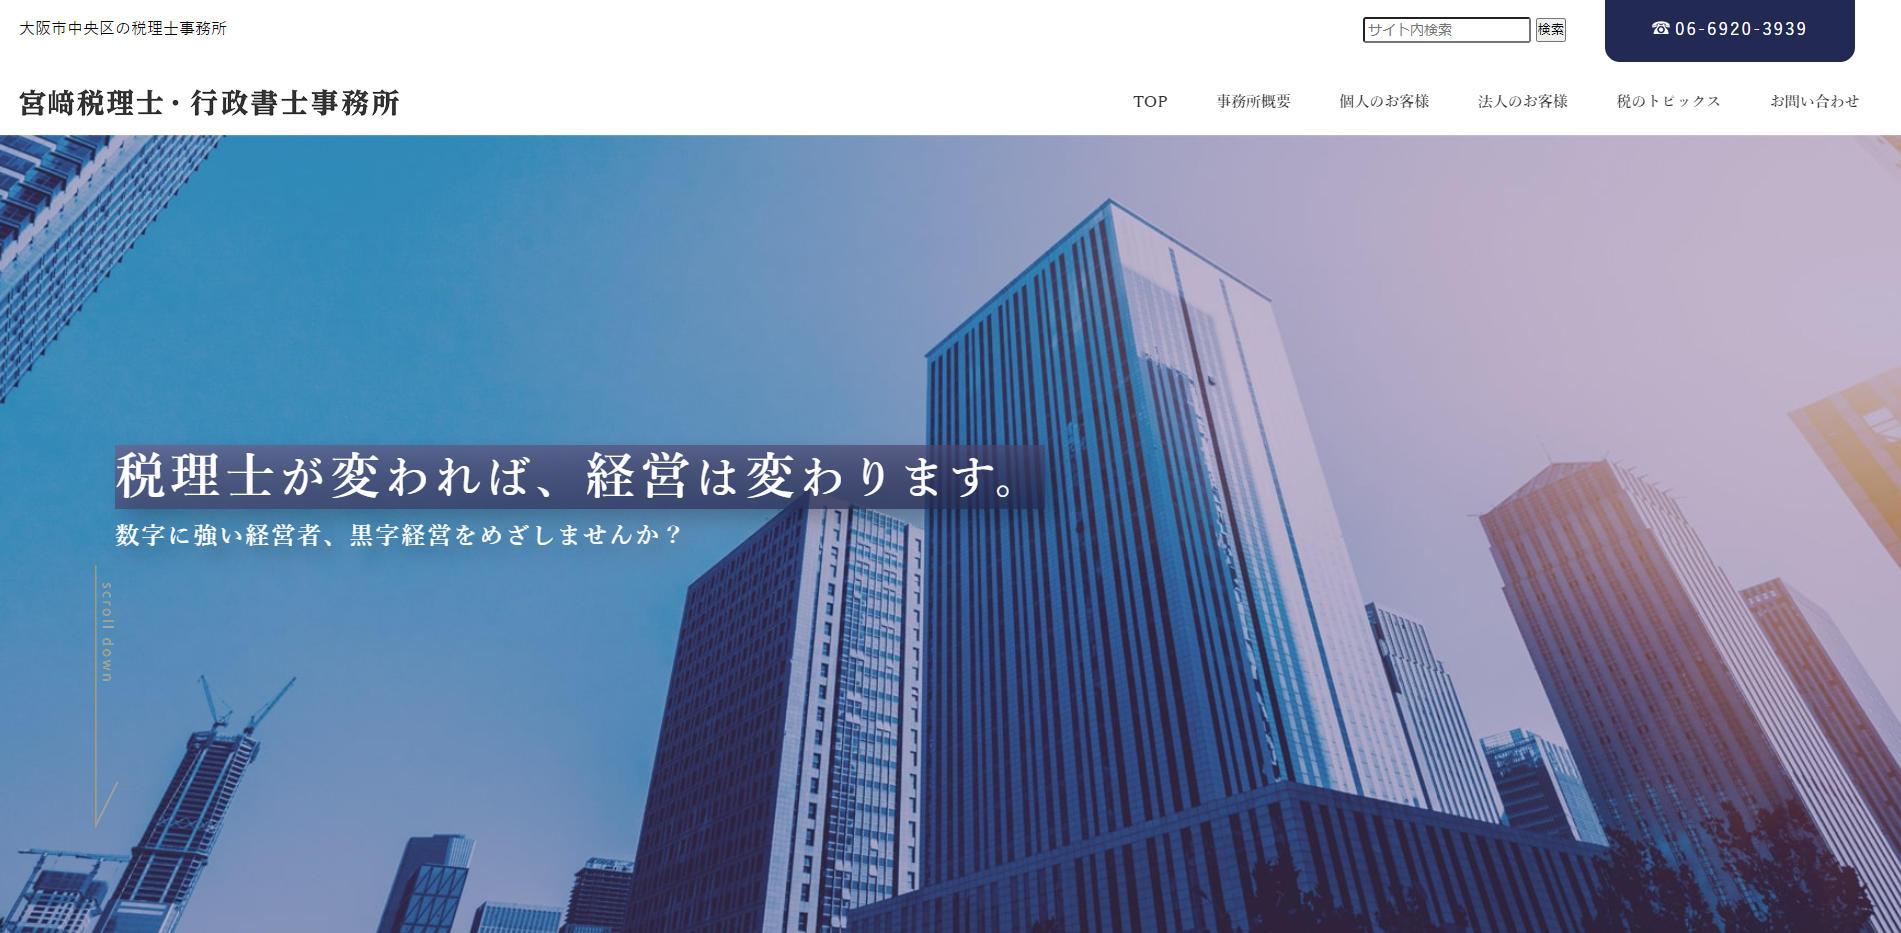 宮﨑税理士・行政書士事務所パソコン版